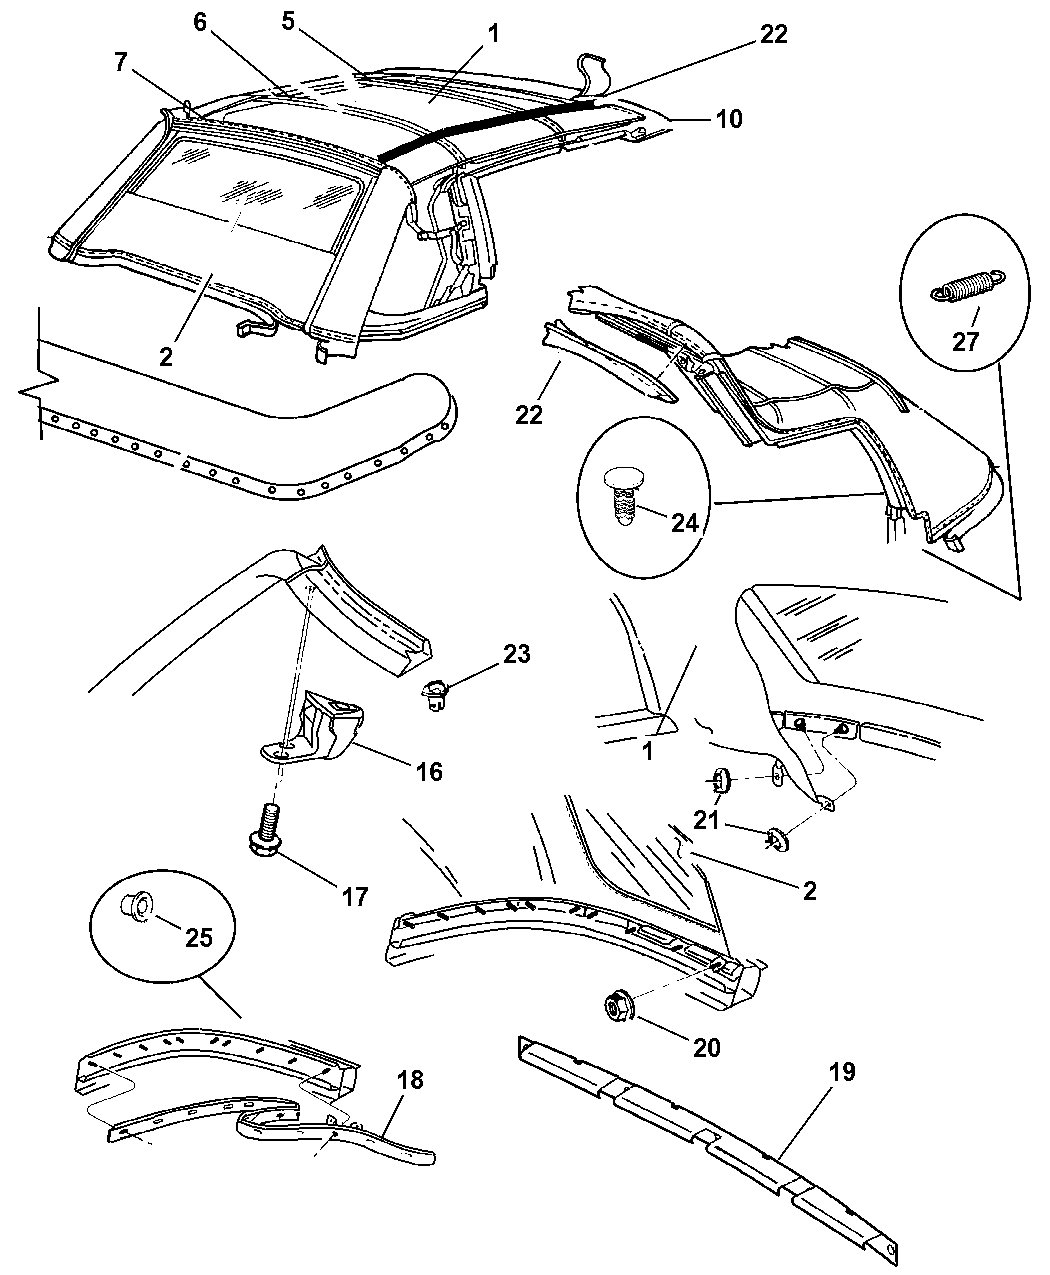 2006 Chrysler Sebring Convertible Top